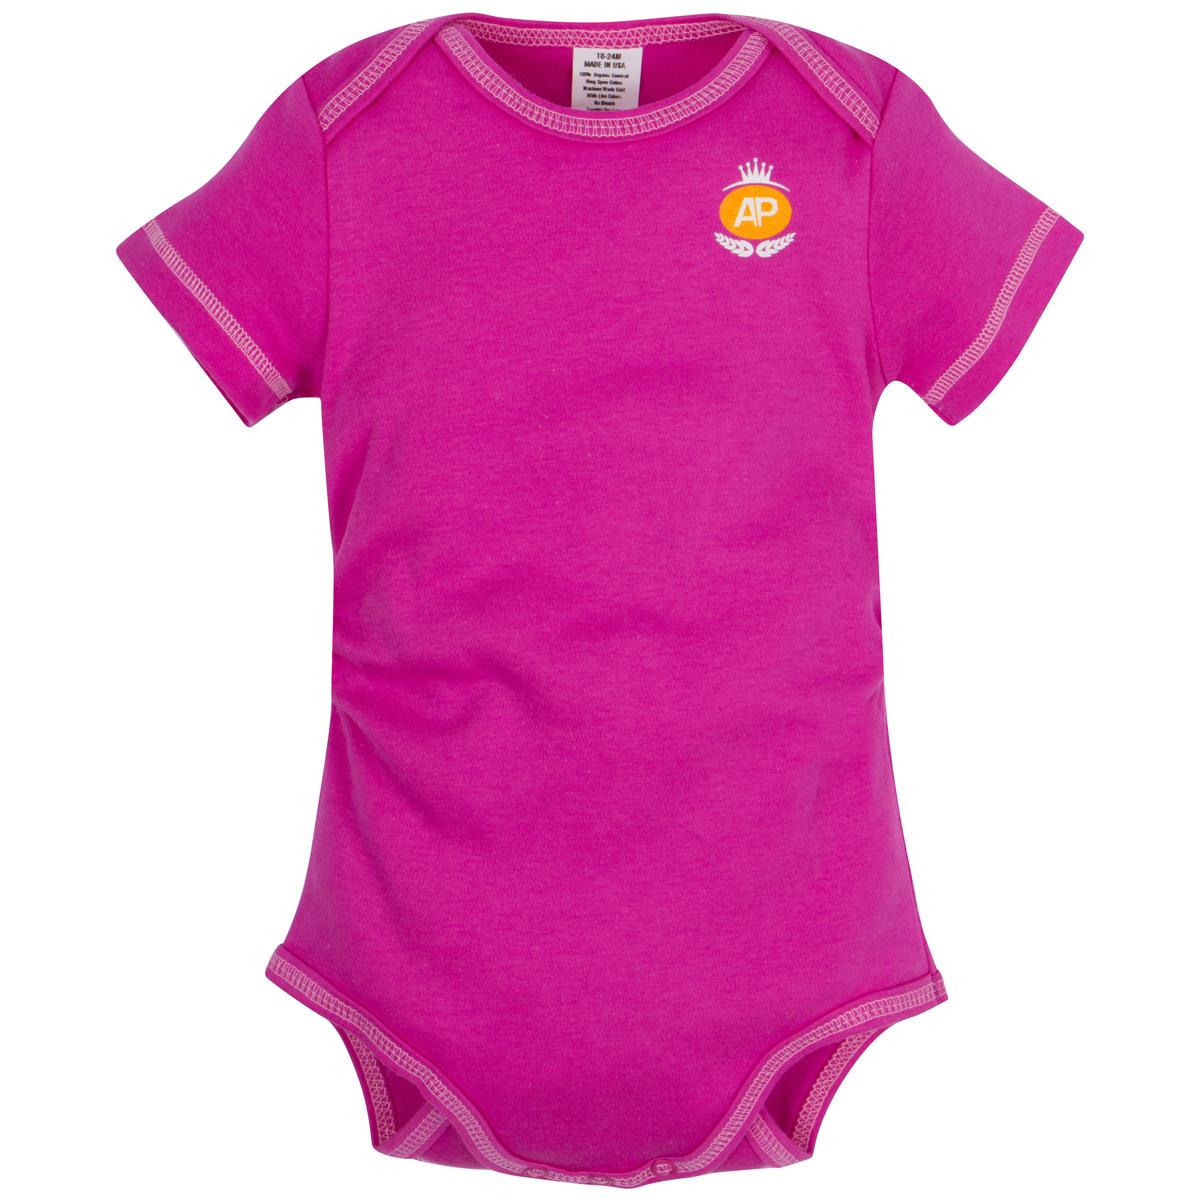 Tropical Pink Organic Adjustable Bodysuit Short-Sleeve